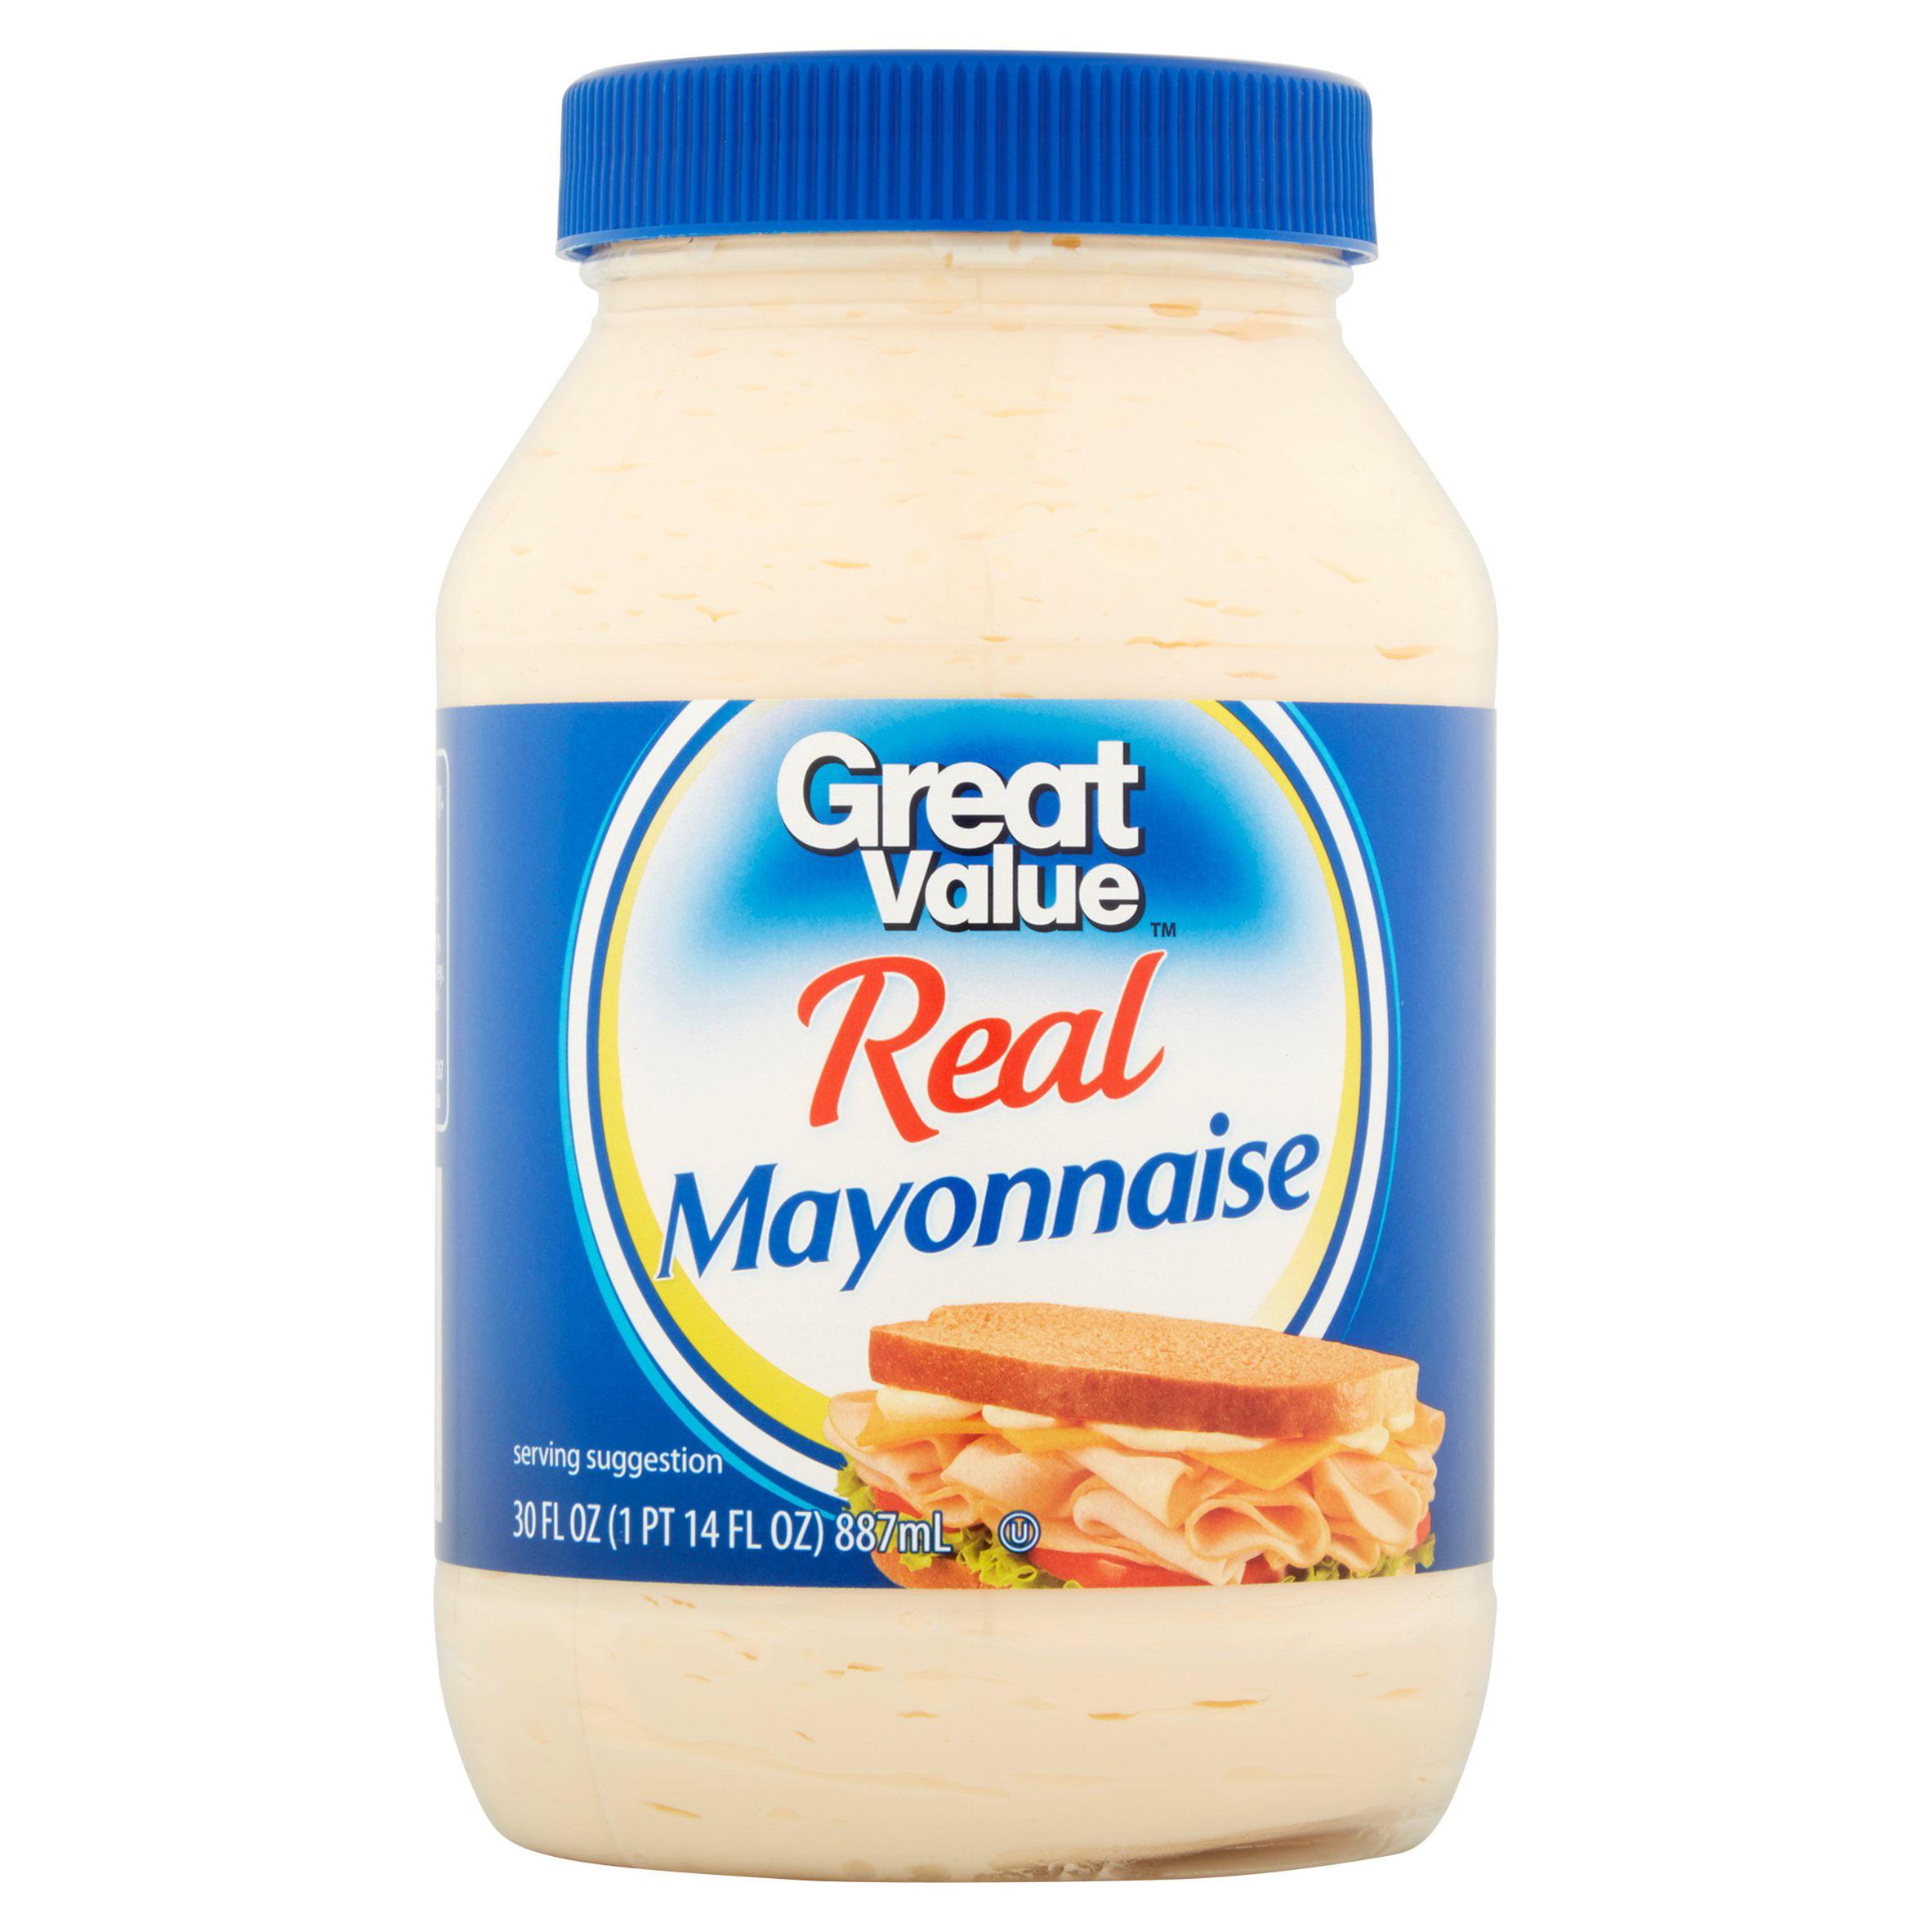 Great Value Real Mayonnaise, 30 fl oz